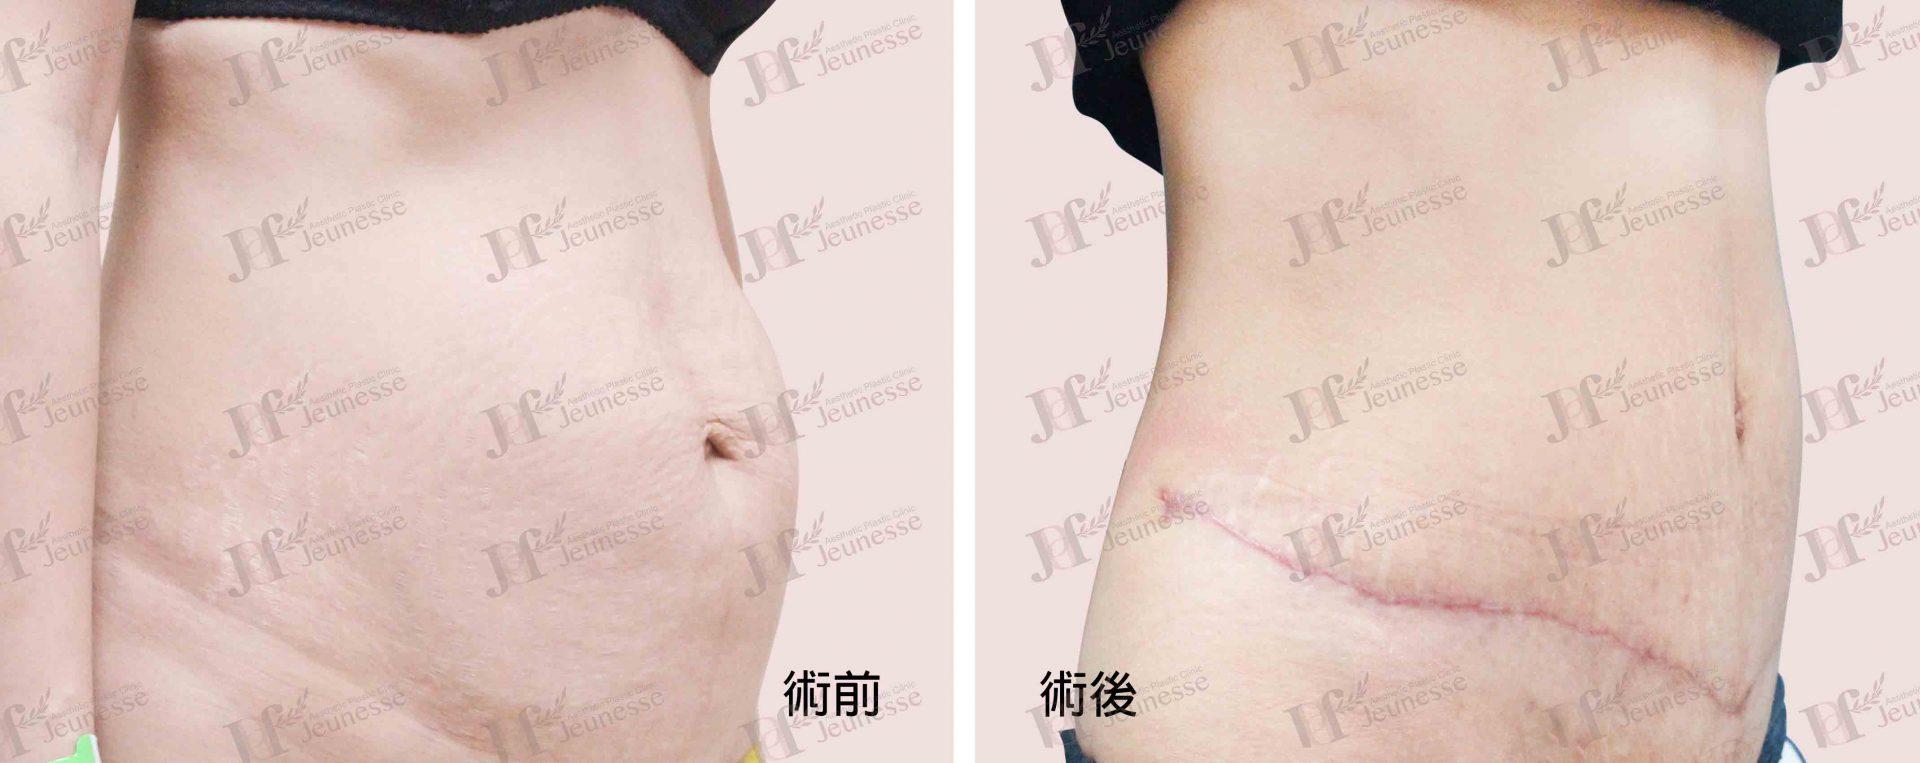 Abdominoplasty腹部成形術及抽脂手術 case 5 45度-浮水印